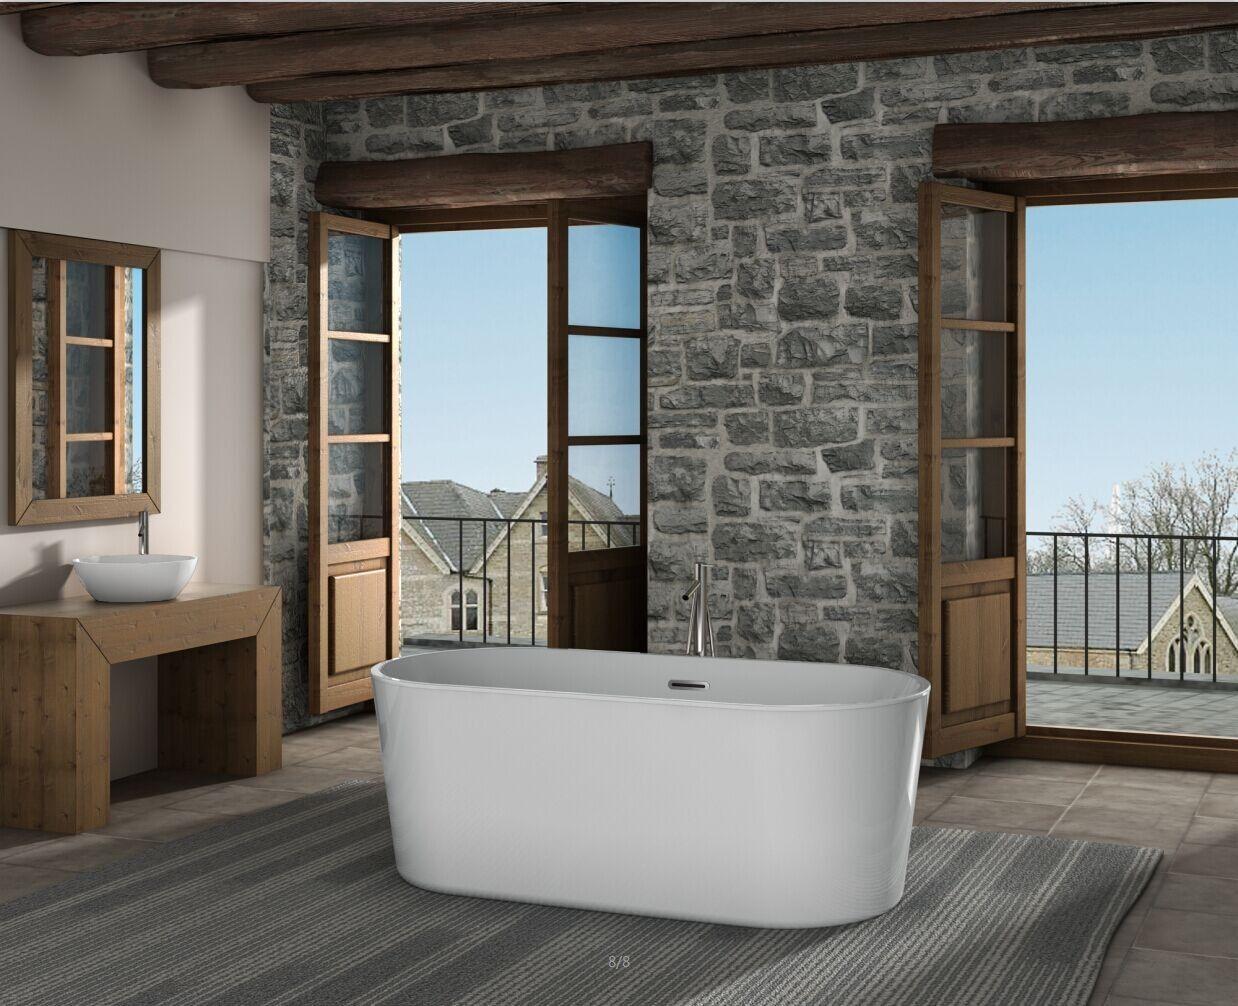 Napoli Oceania Bathroom design, Free standing tub